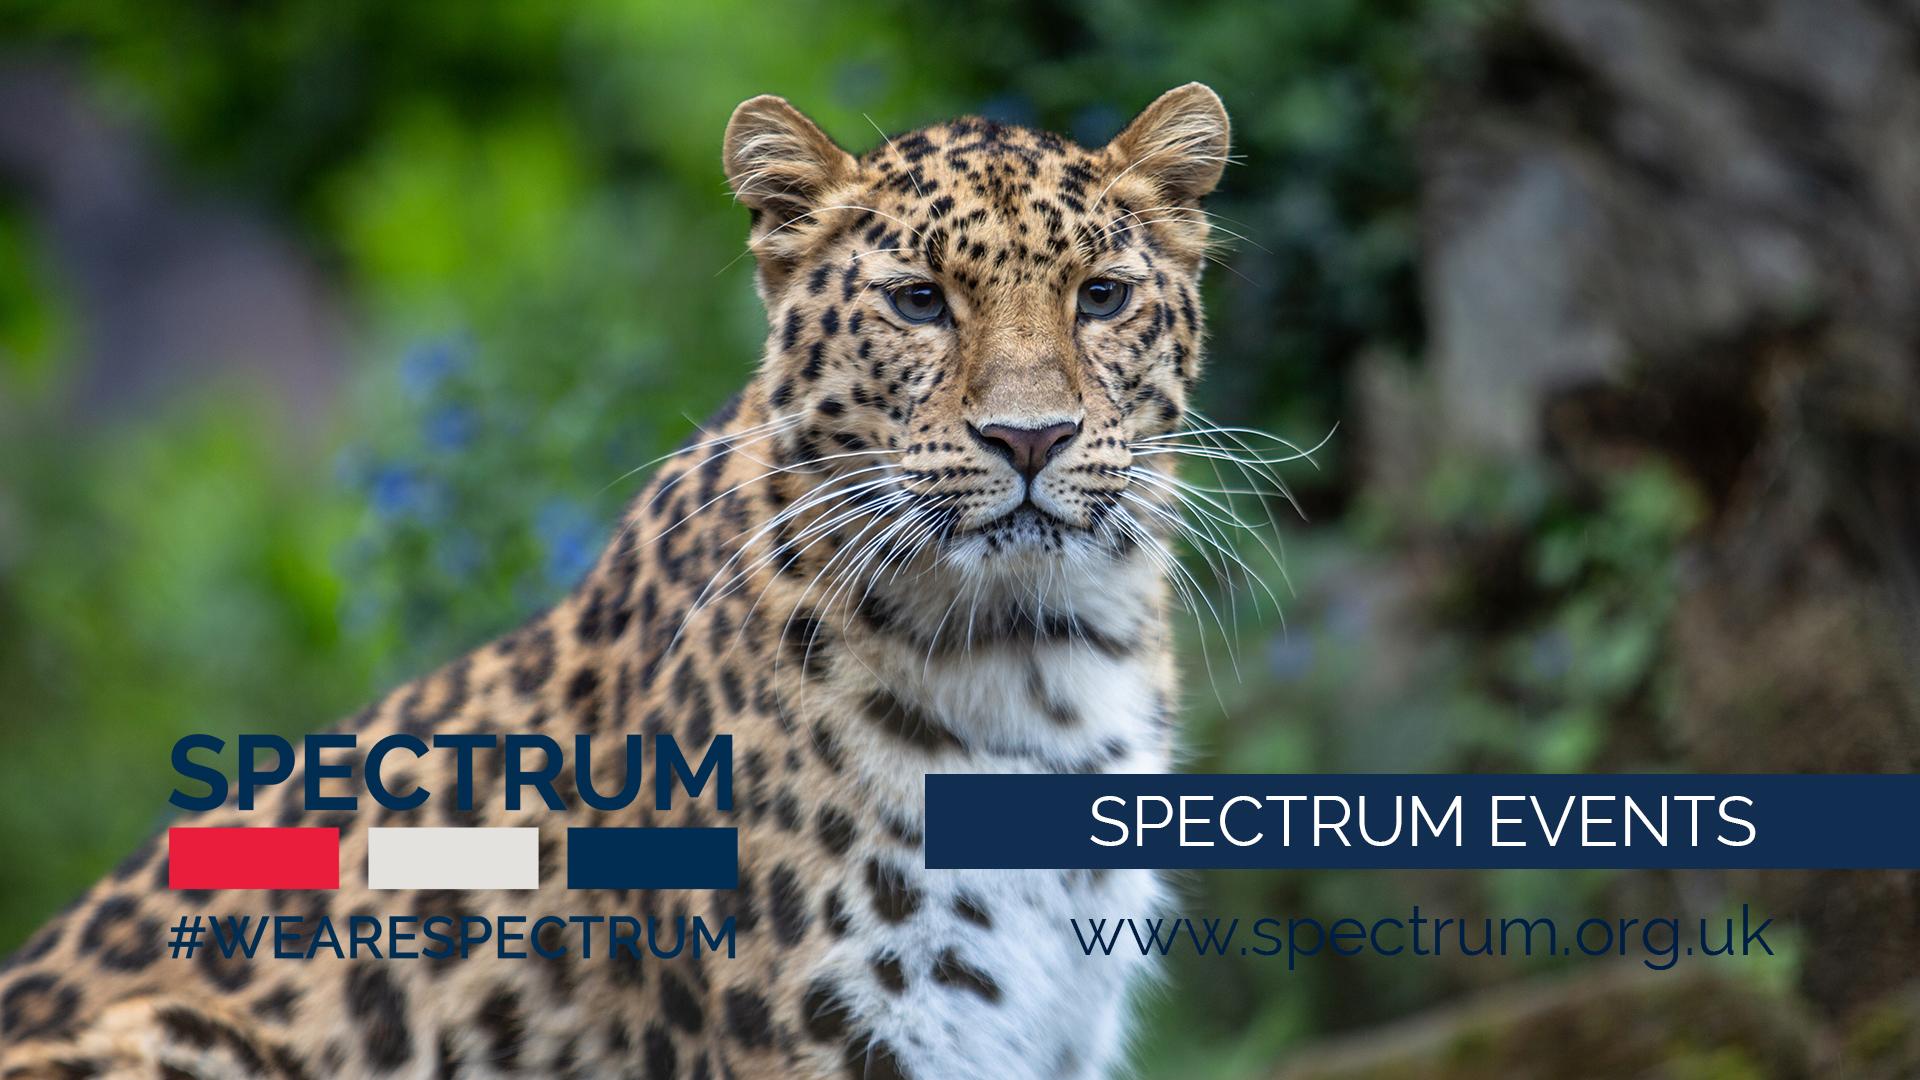 Events at Spectrum